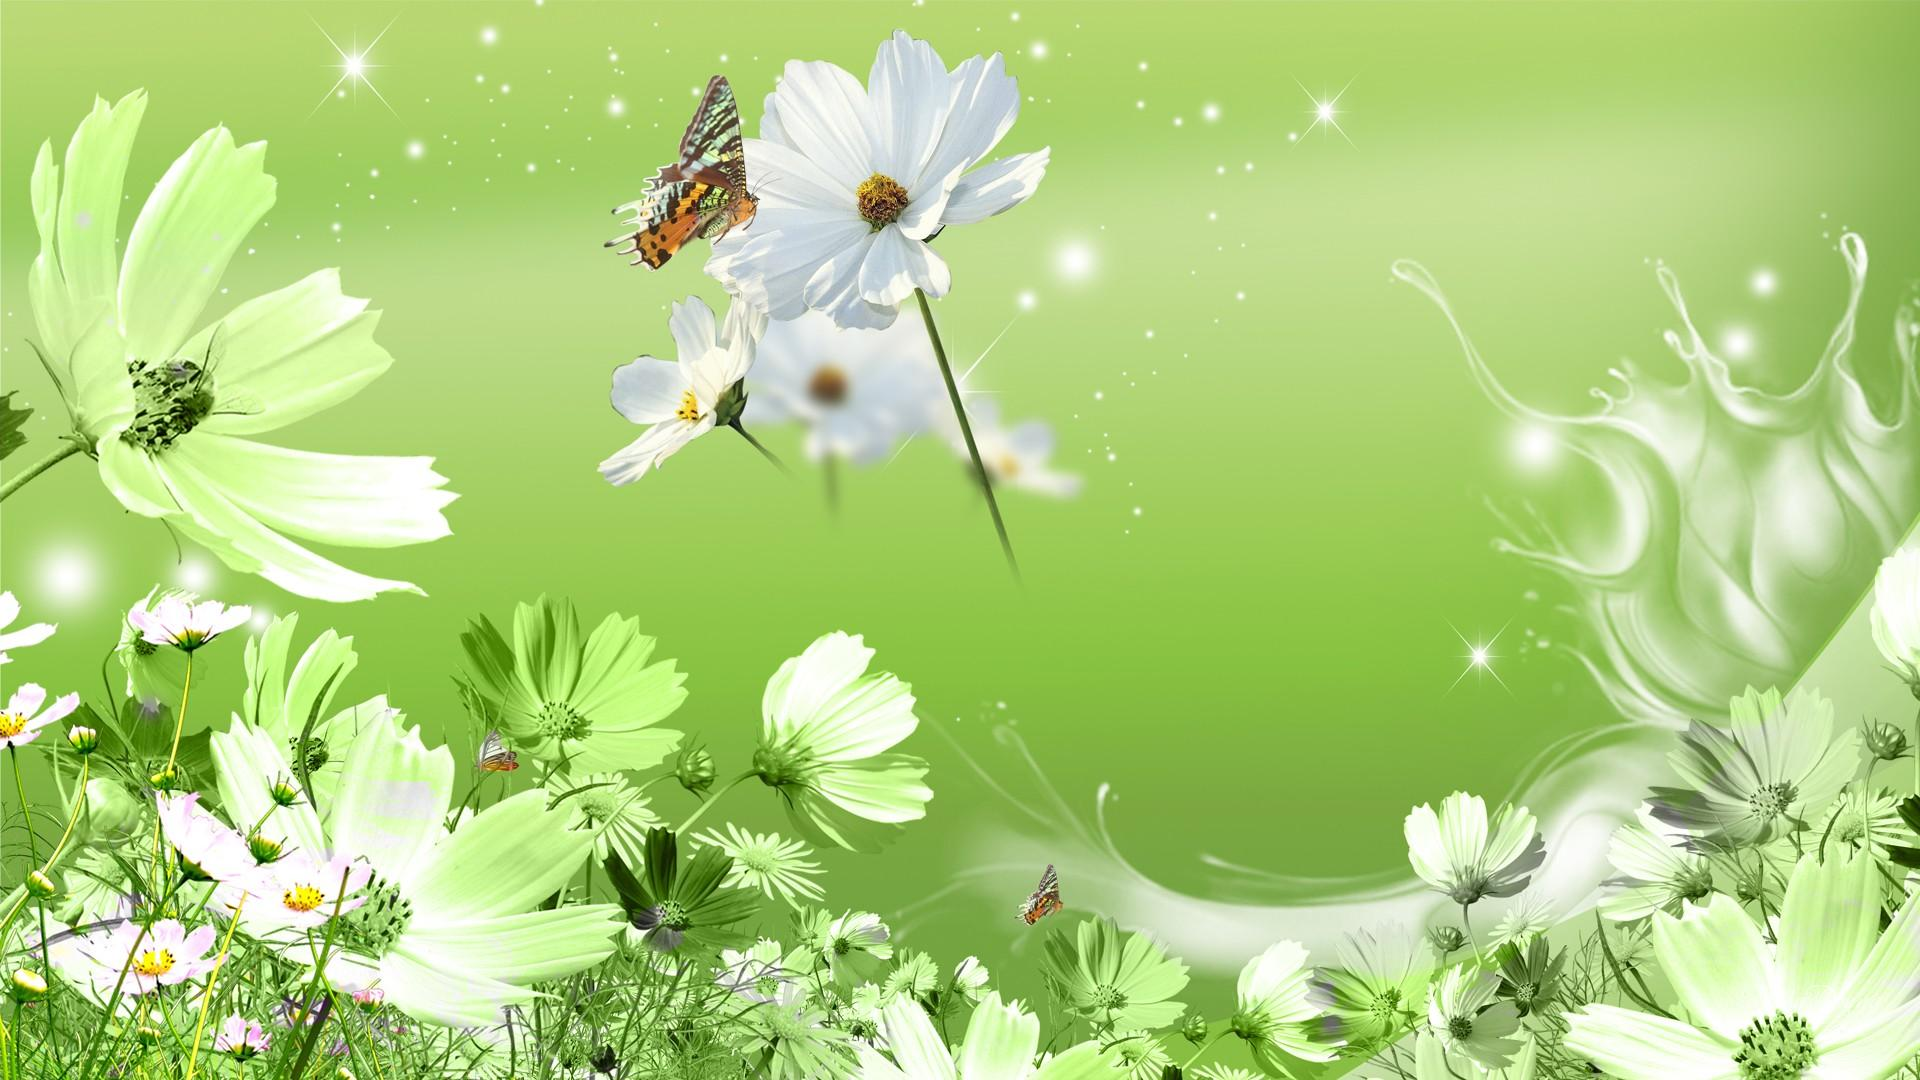 amazing natural flower image